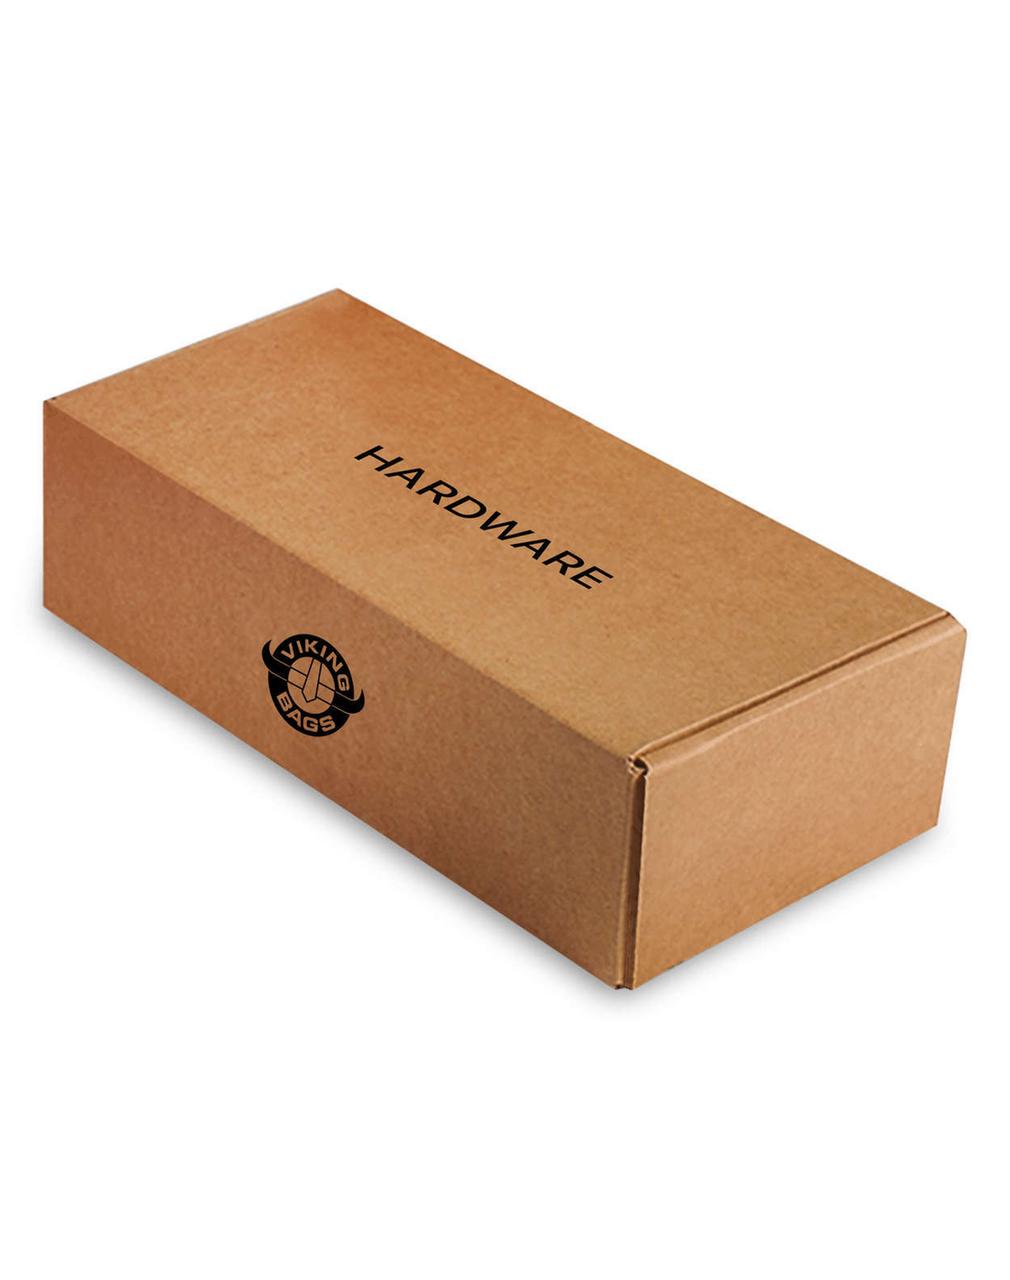 Honda 1500 Valkyrie Interstate Side Pocket Motorcycle Saddlebags Hardware Box